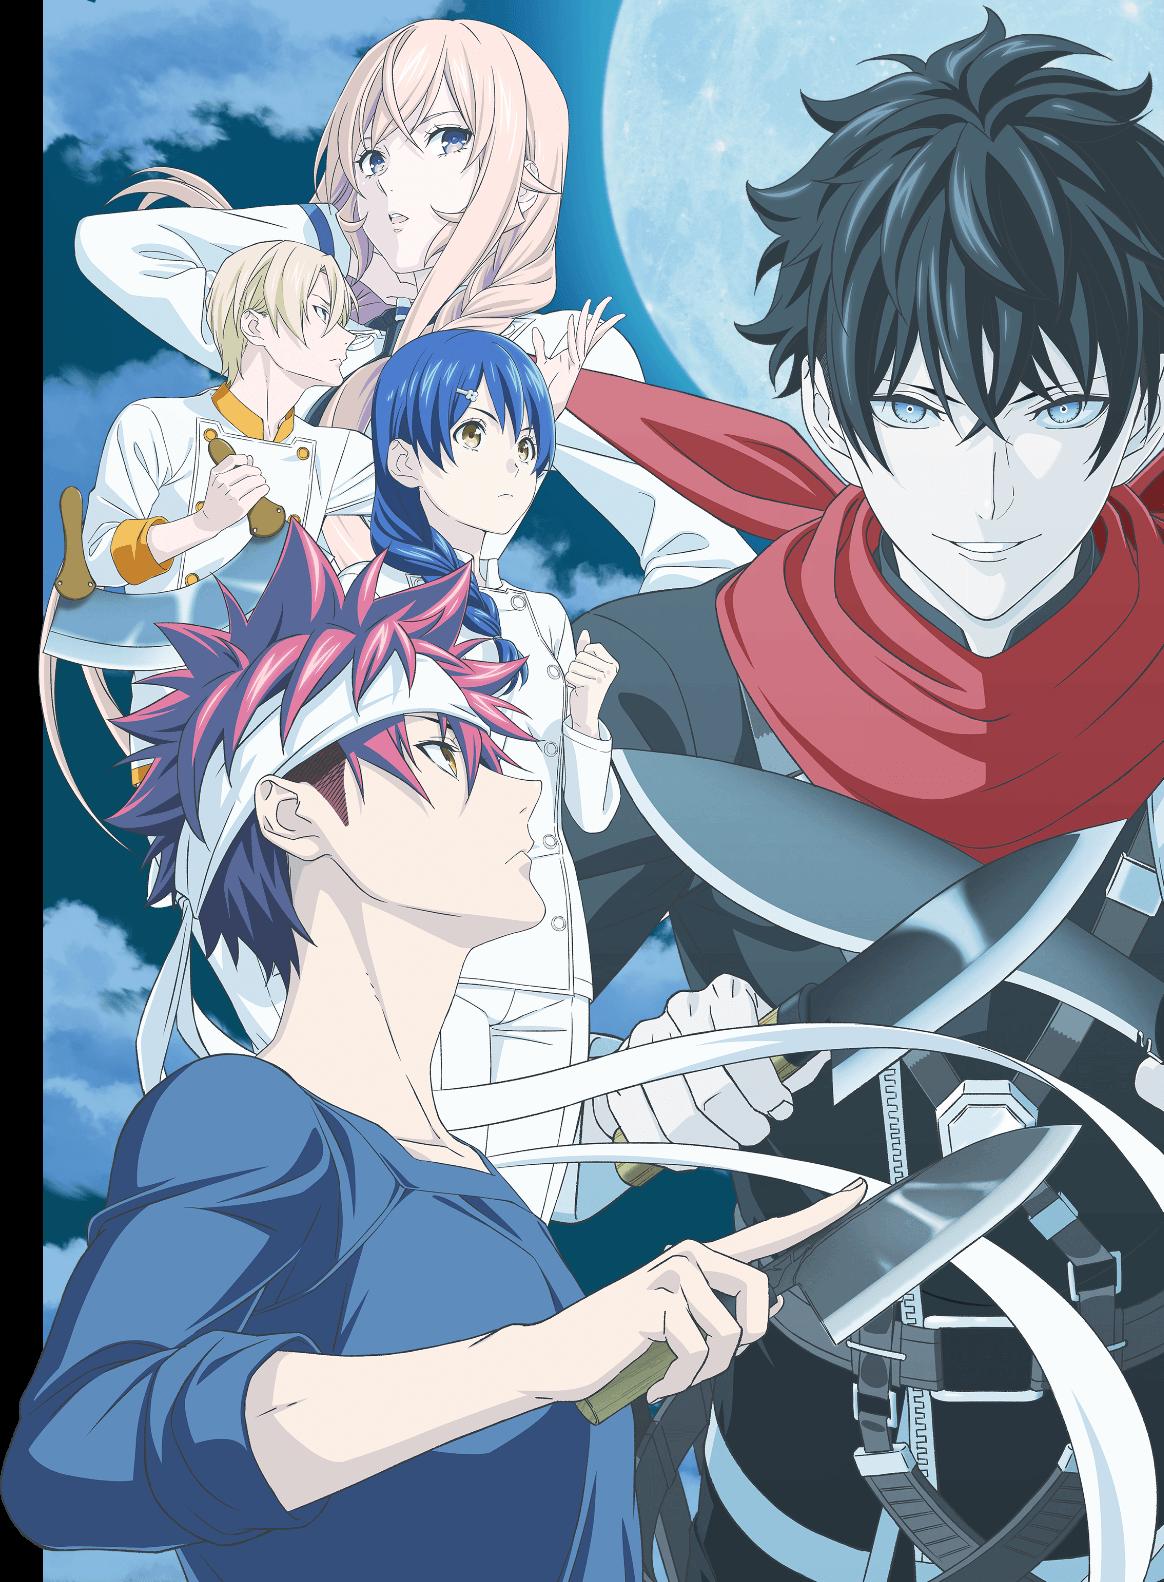 TVアニメ『食戟のソーマ 豪ノ皿』3話以降の放送・配信が2020年7月以降に延期